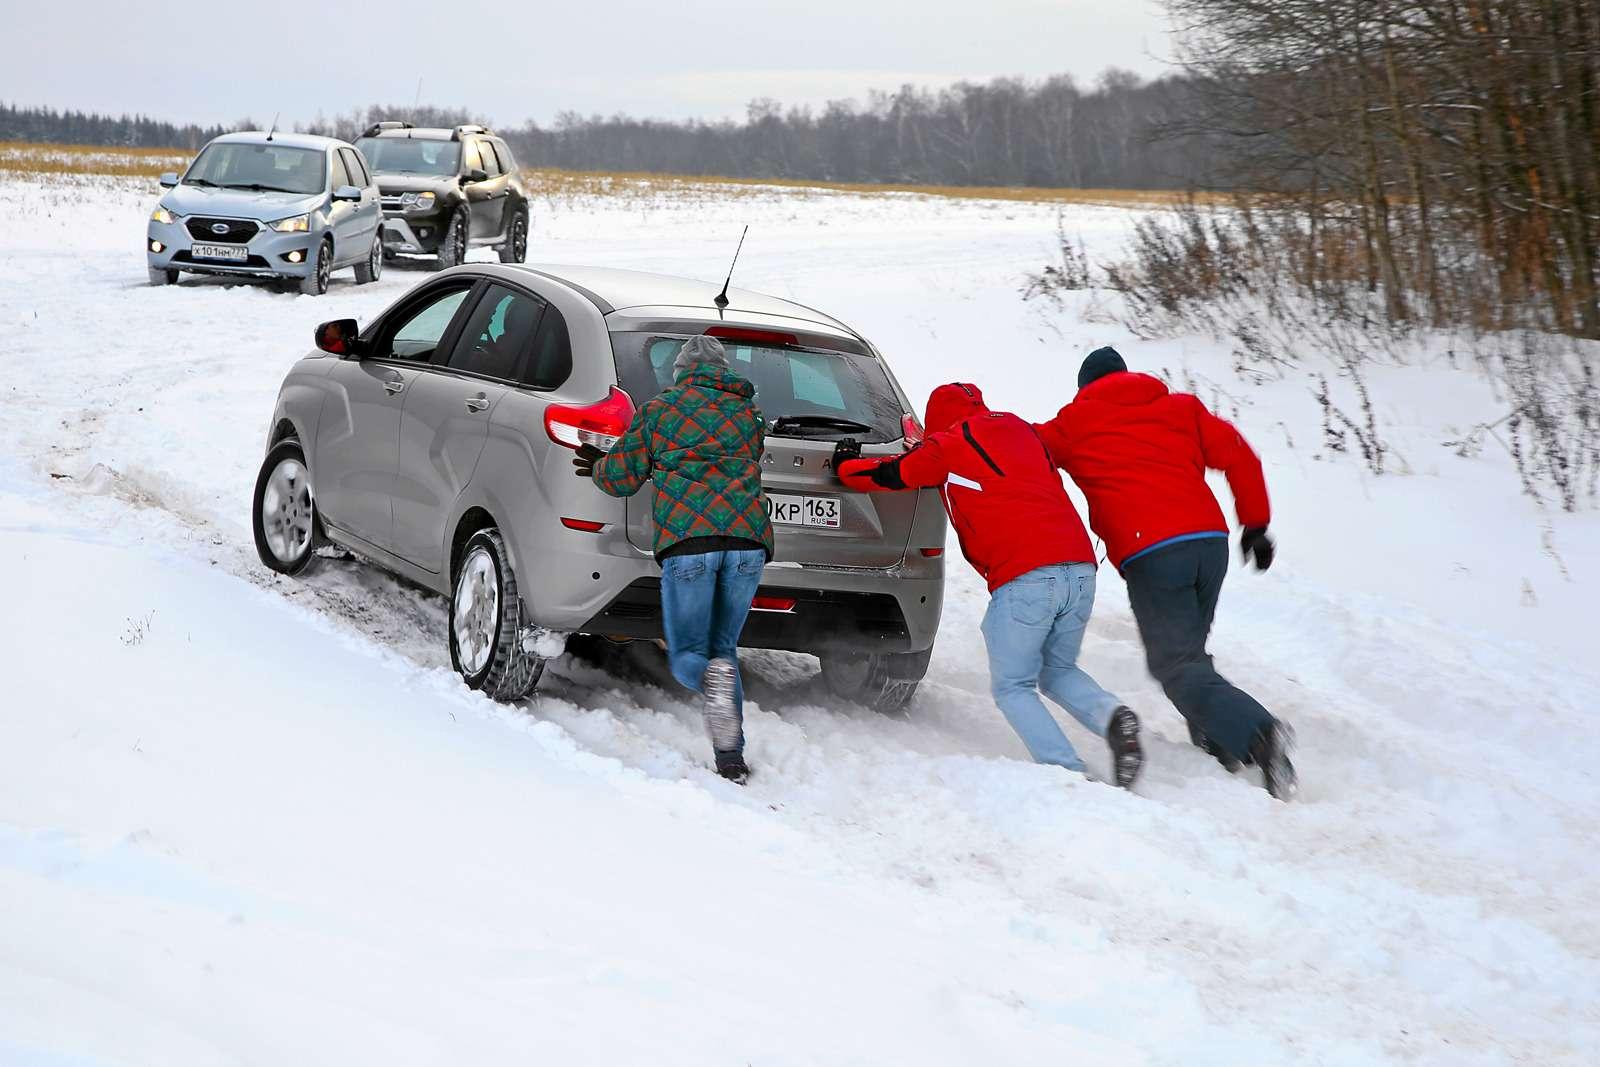 Большой зимний тест: Lada Vesta, Lada XRAY иDatsun mi-DO изпарка ЗР— фото 571440